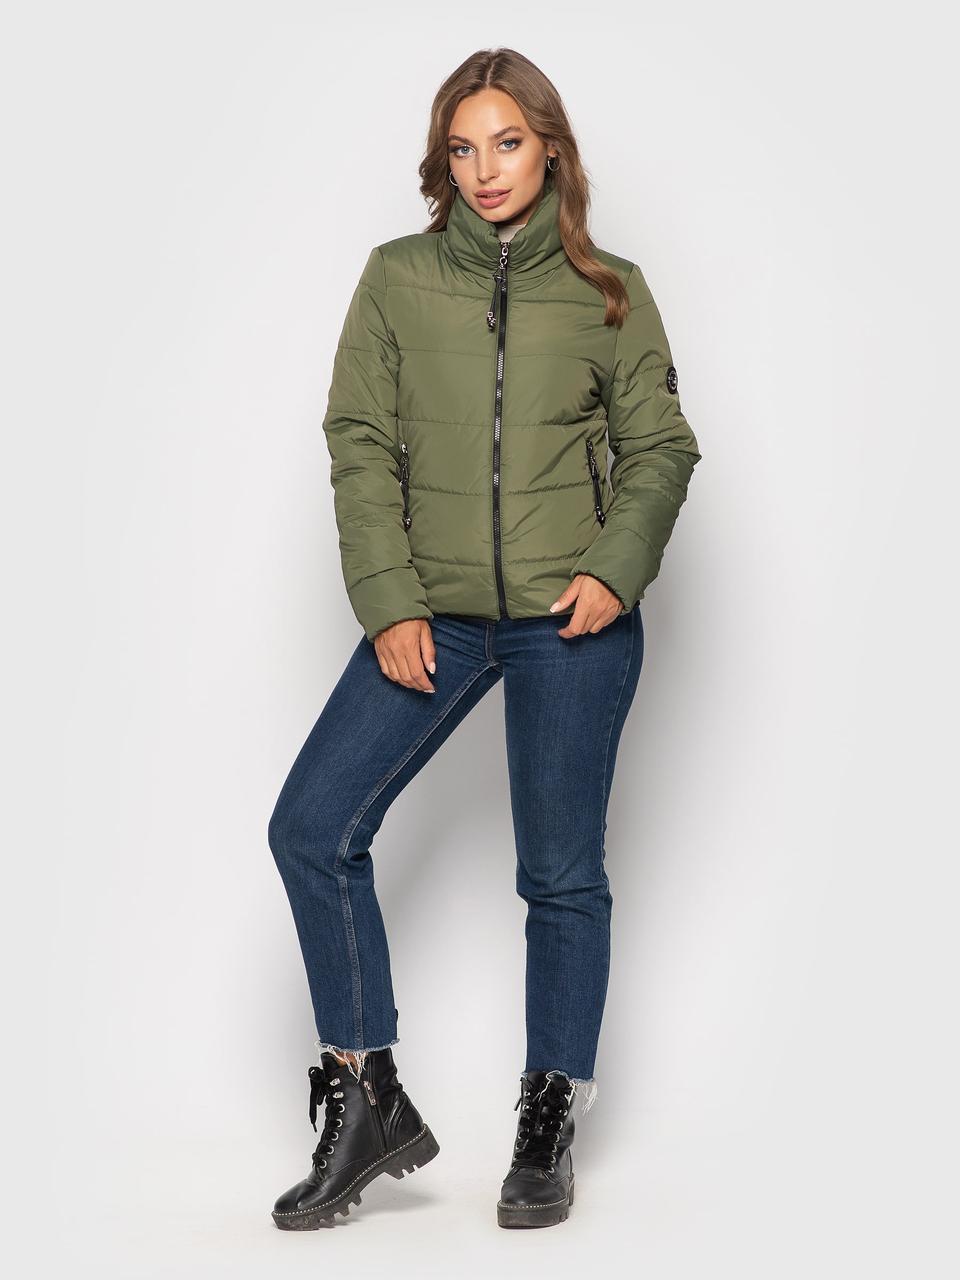 Демисезонная куртка Ирина хаки(42-52)